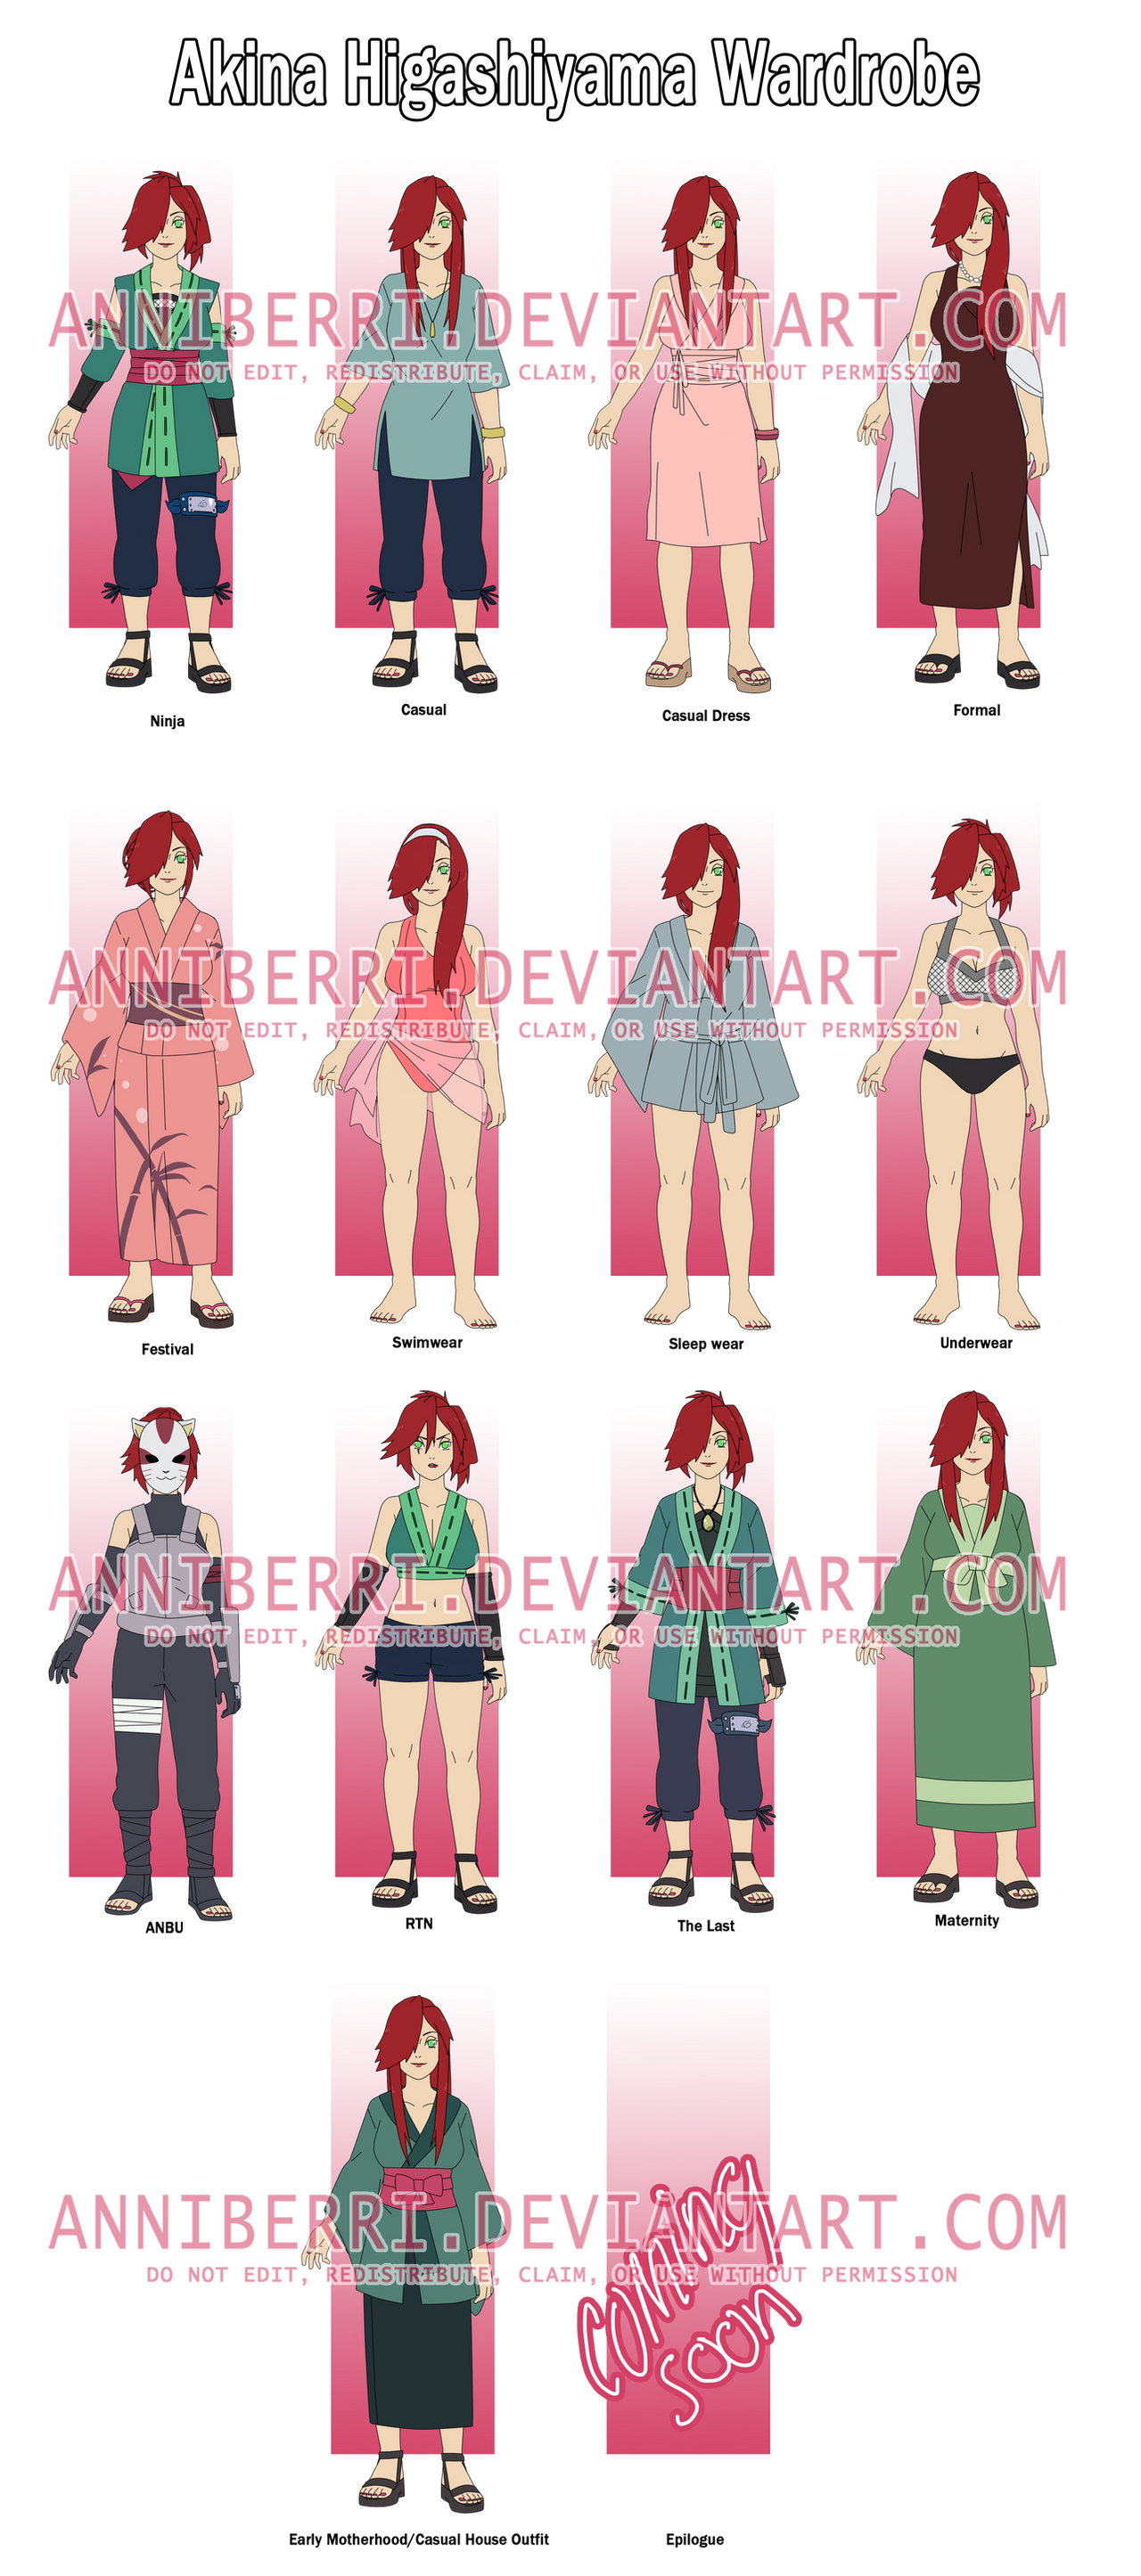 Akina's Wardrobe -REMAKE- by anniberri